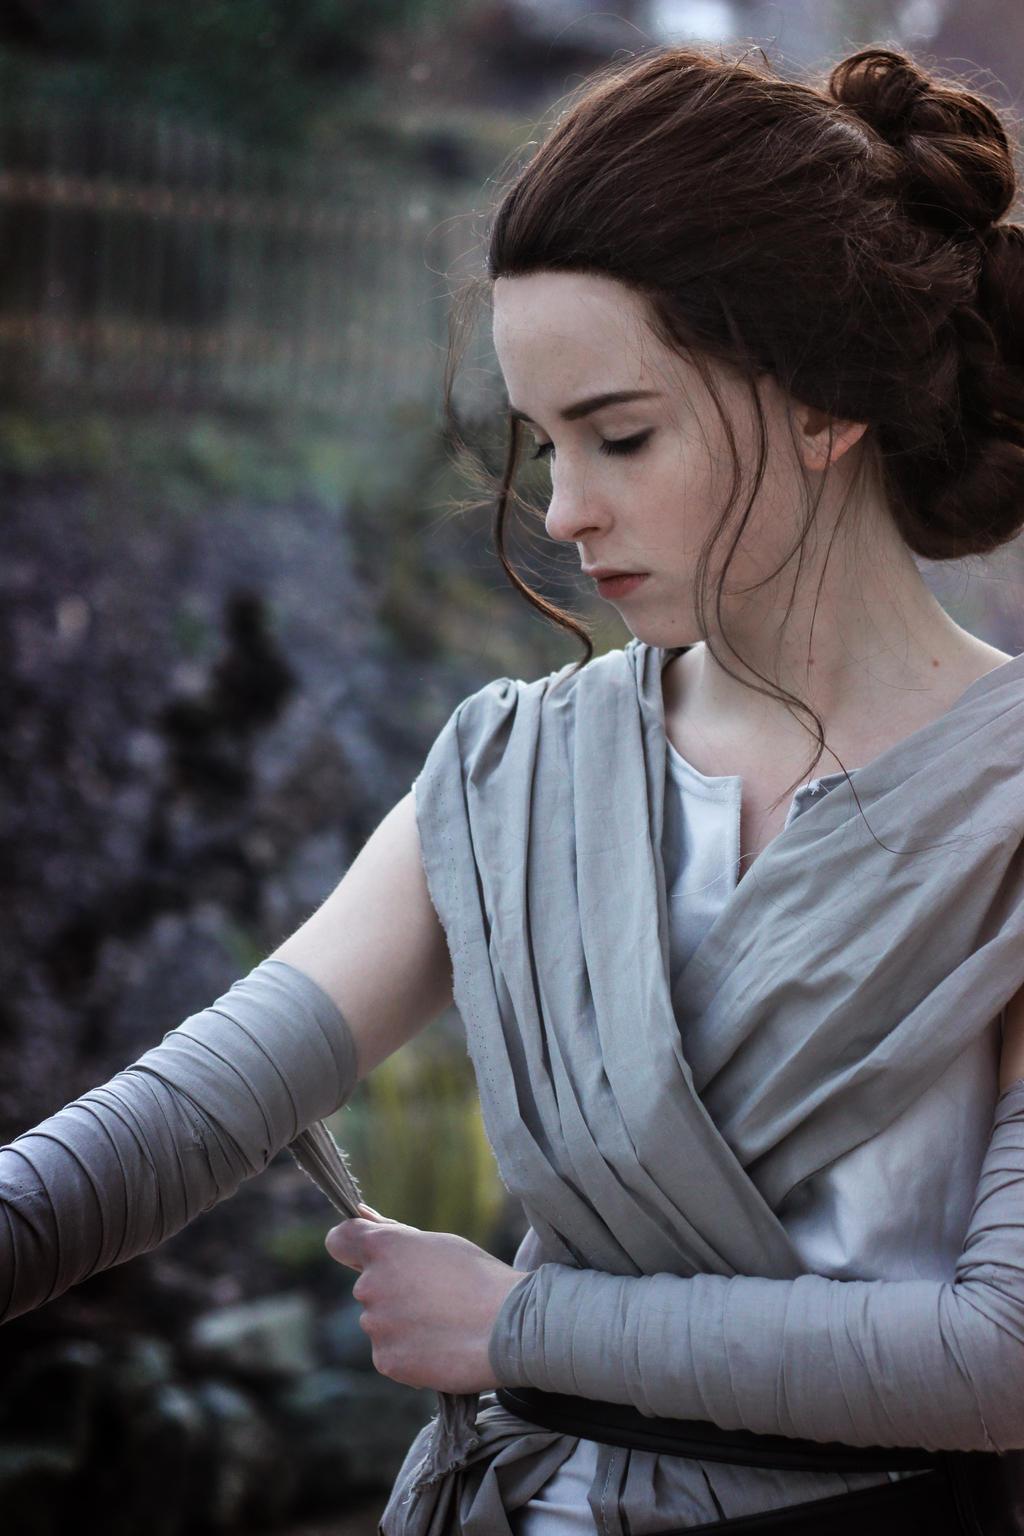 Rey - Star Wars #2 by GuppatheHutt